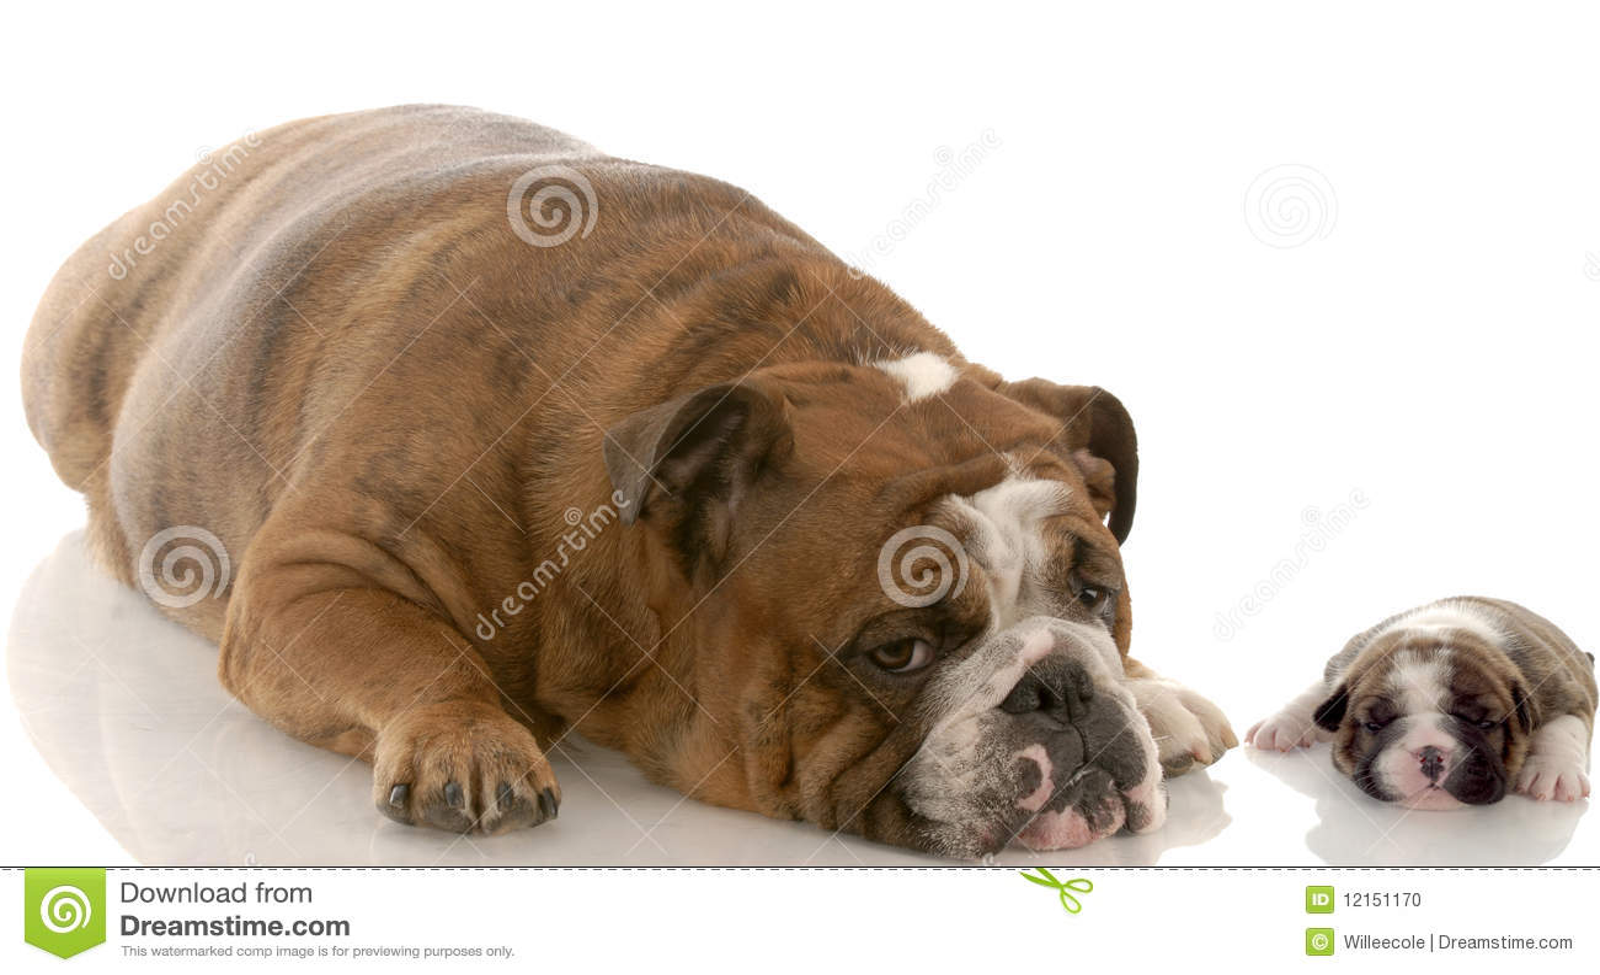 Mother And Puppy English Bulldog Stock Photo - Image: 12151170